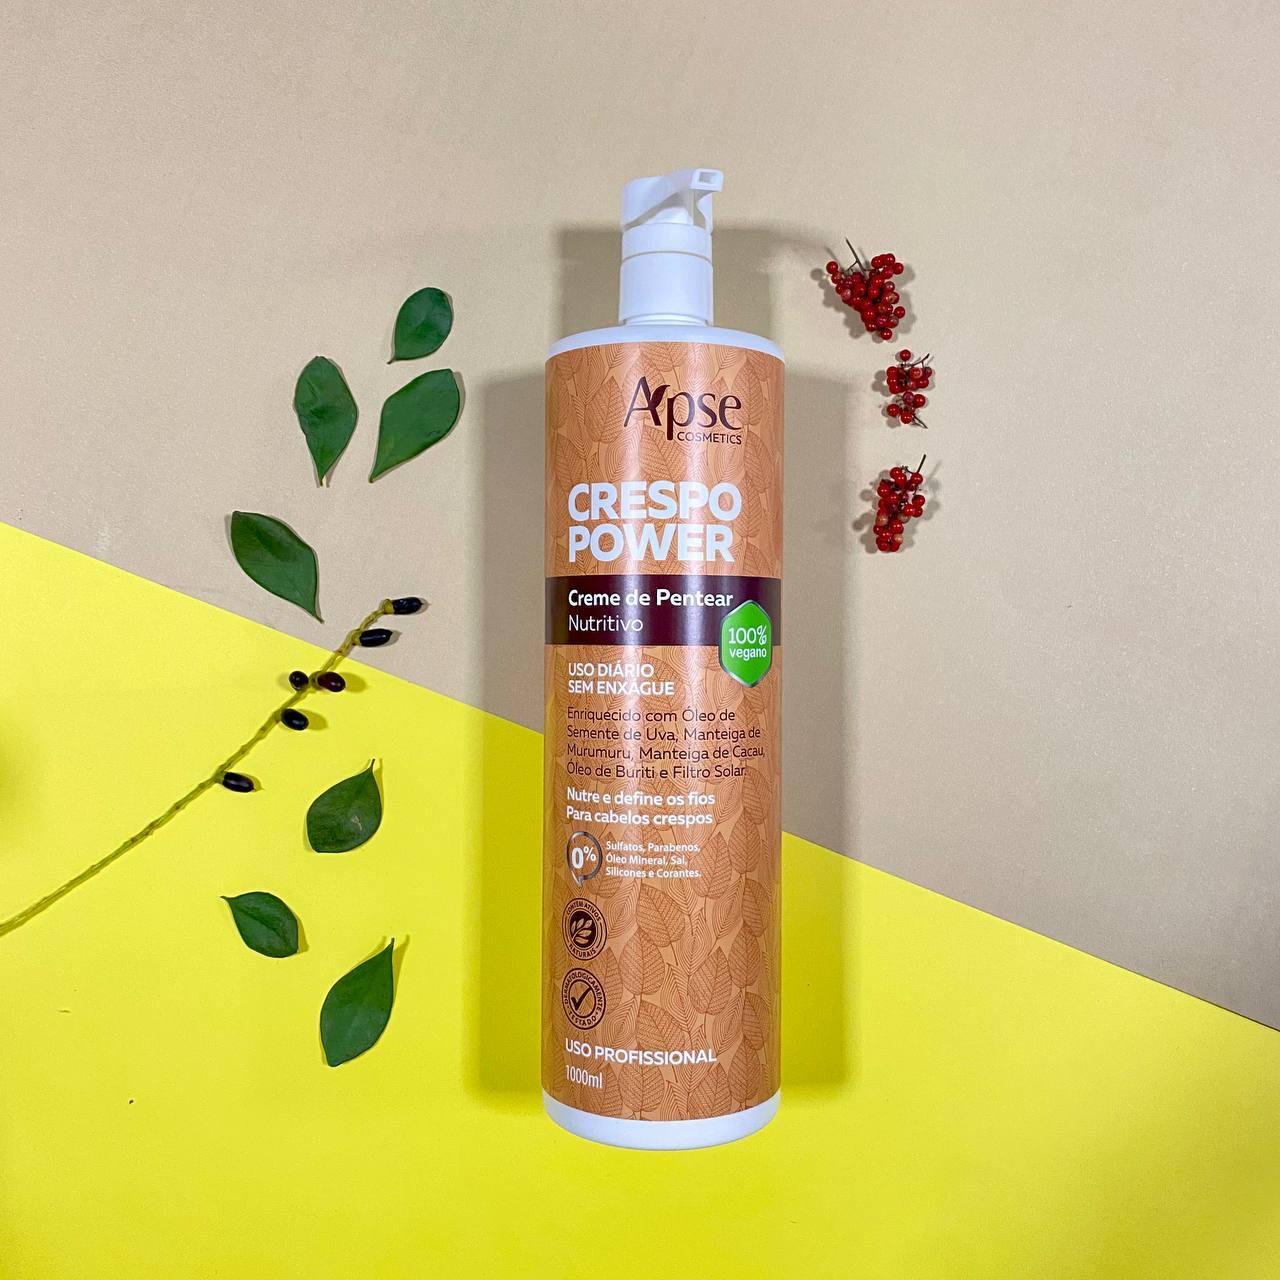 Creme de Pentear Nutritivo Crespo Power - Apse Cosmetics 1000ml